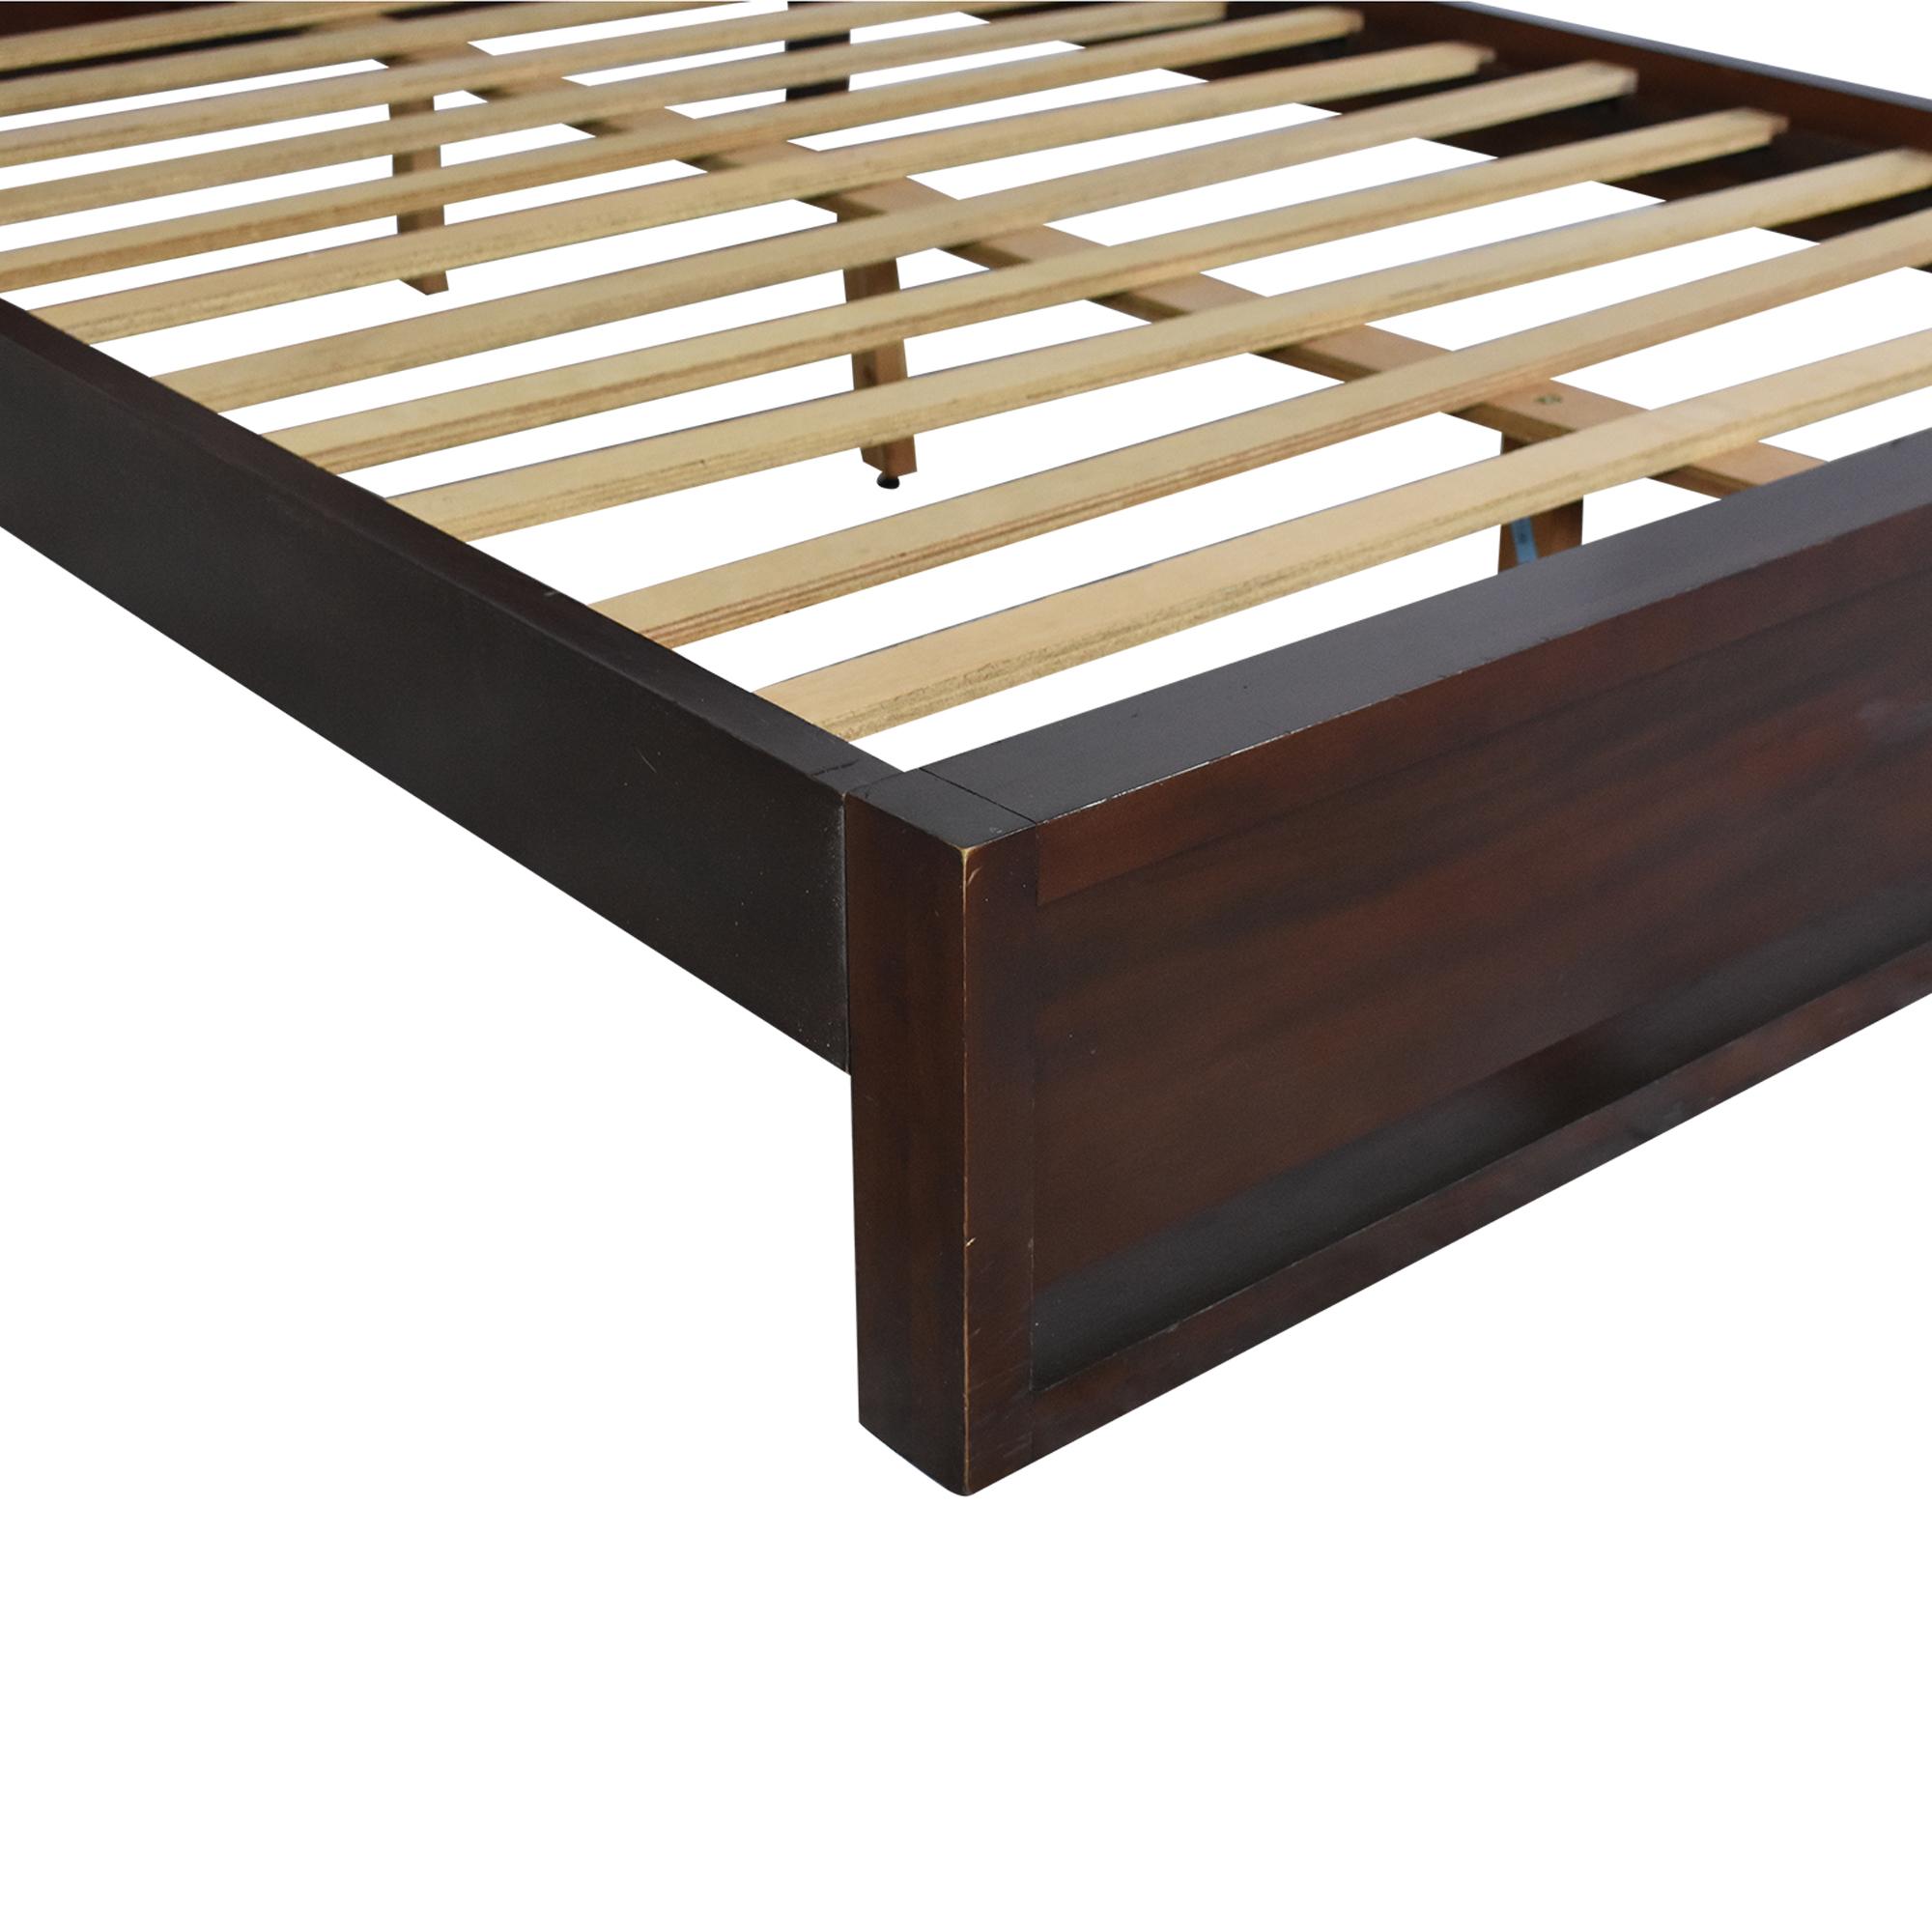 Casana Furniture Casana Queen Platform Bed